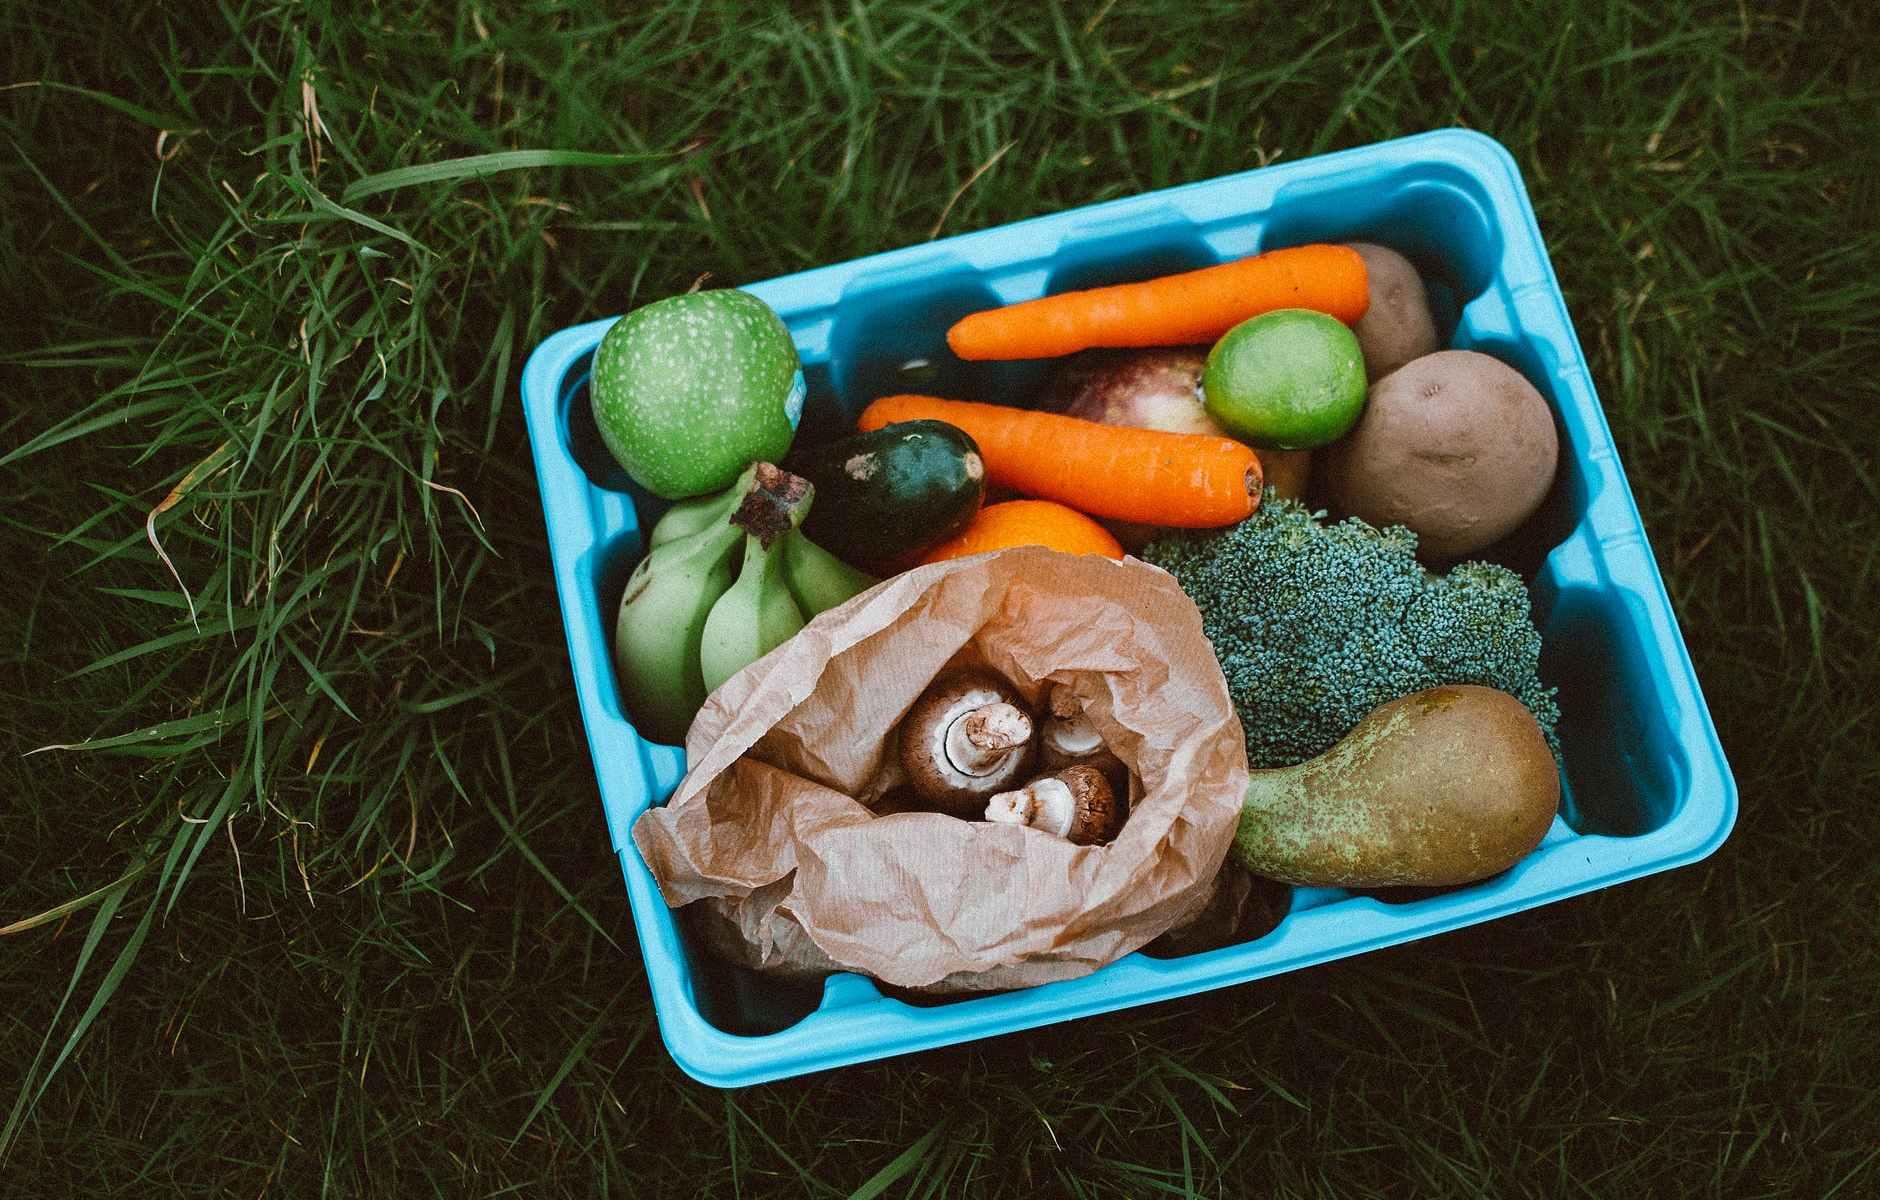 verdura-carote-banane-pera-mela-cibo-food-patate-zucchina